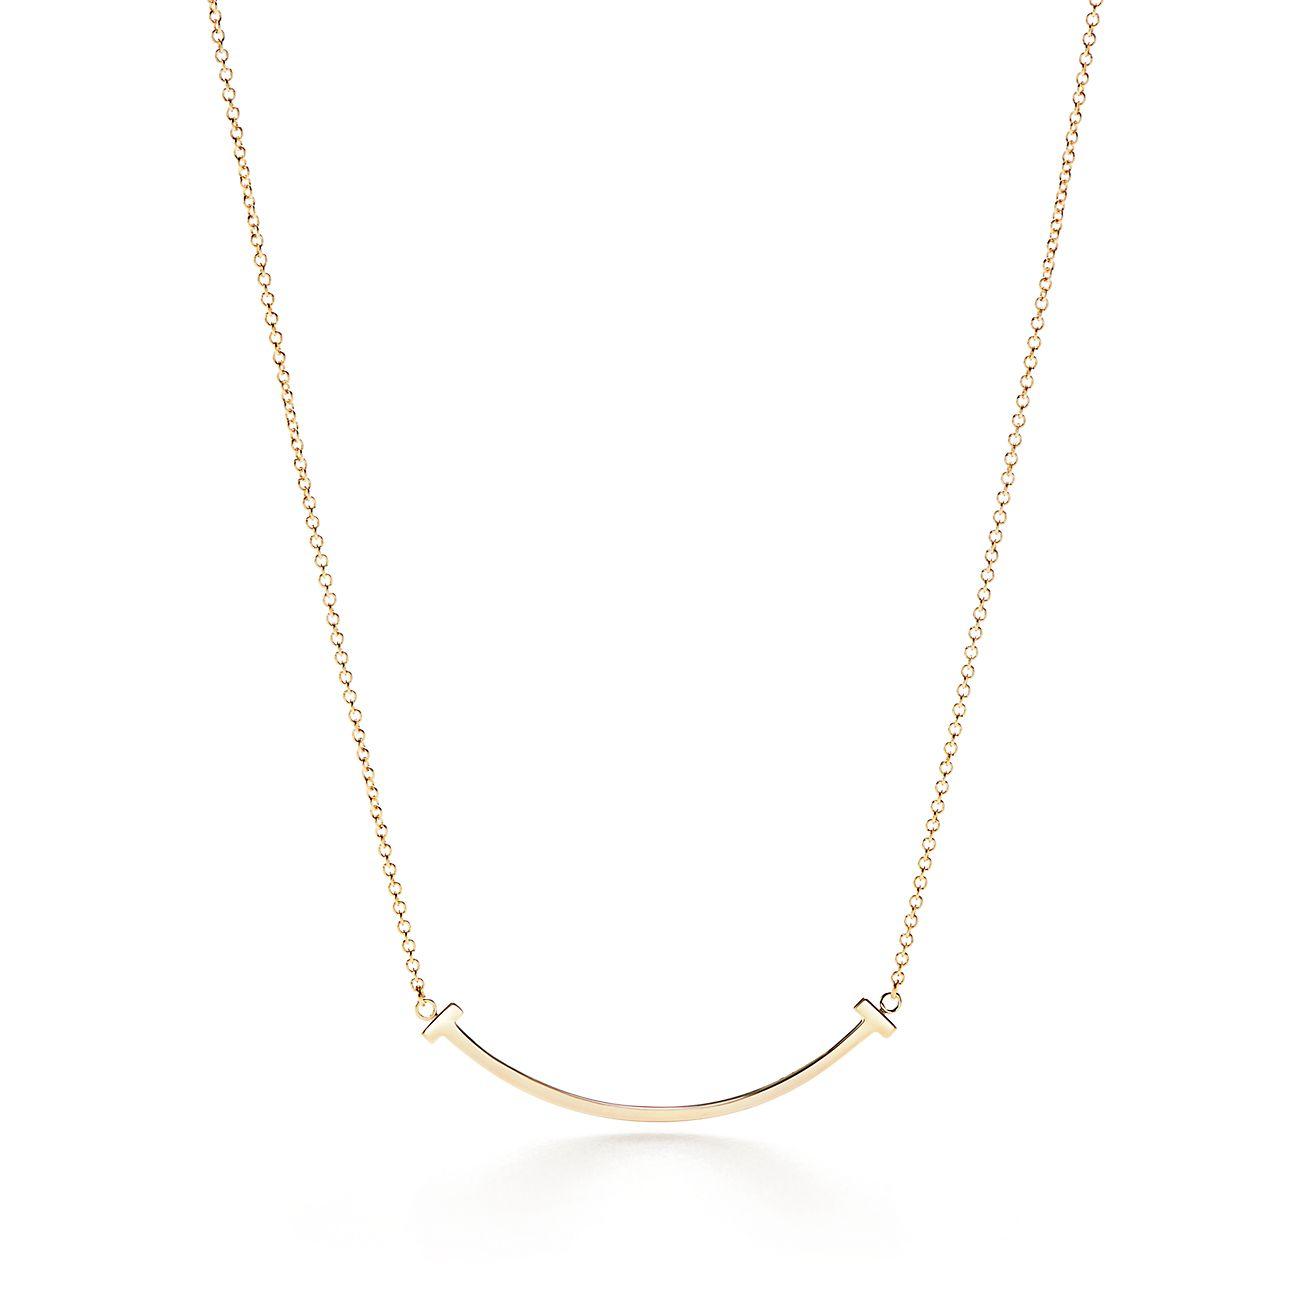 Tiffany t smile pendant in 18k gold mini tiffany co tiffany tsmile pendant aloadofball Image collections